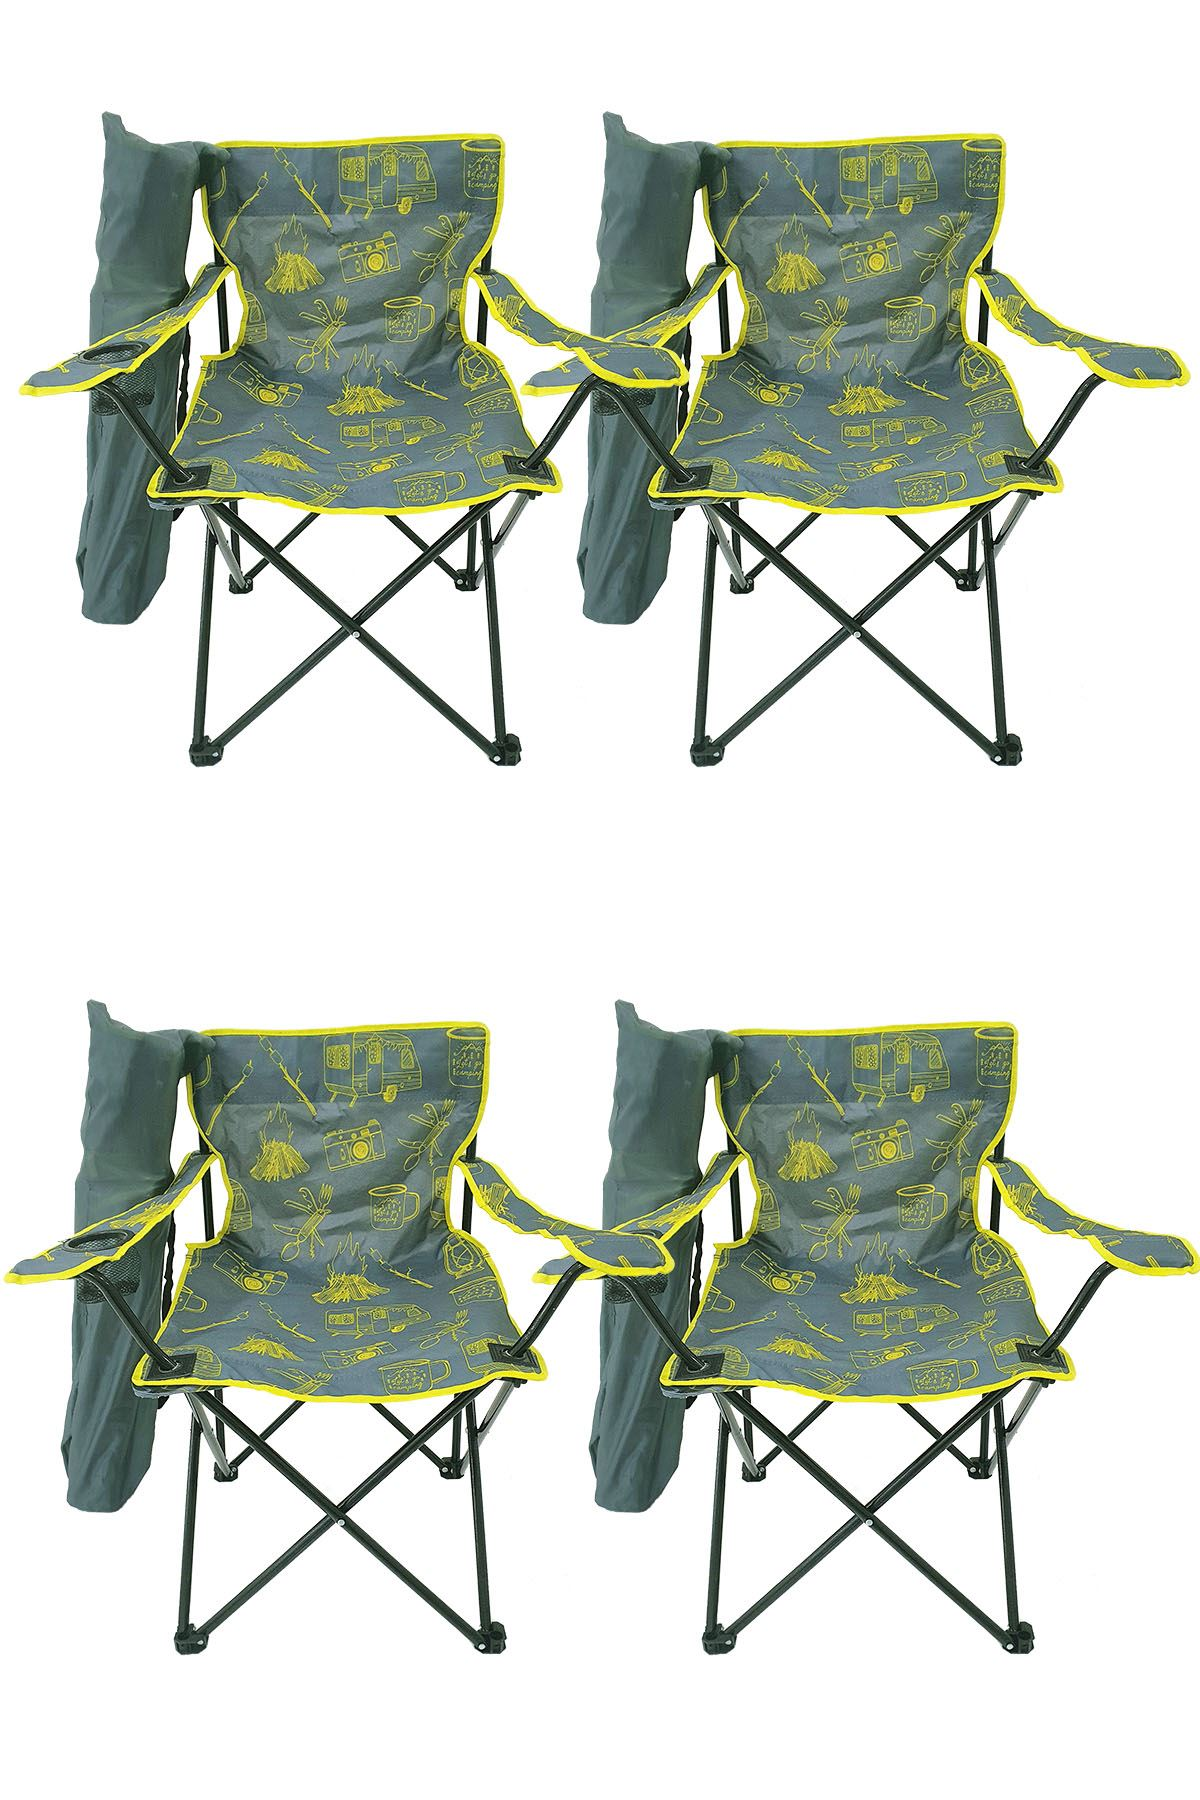 Bofigo 4 Pcs Camping Chair Folding Chair Garden Chair Picnic Beach Chair Patterned Gray